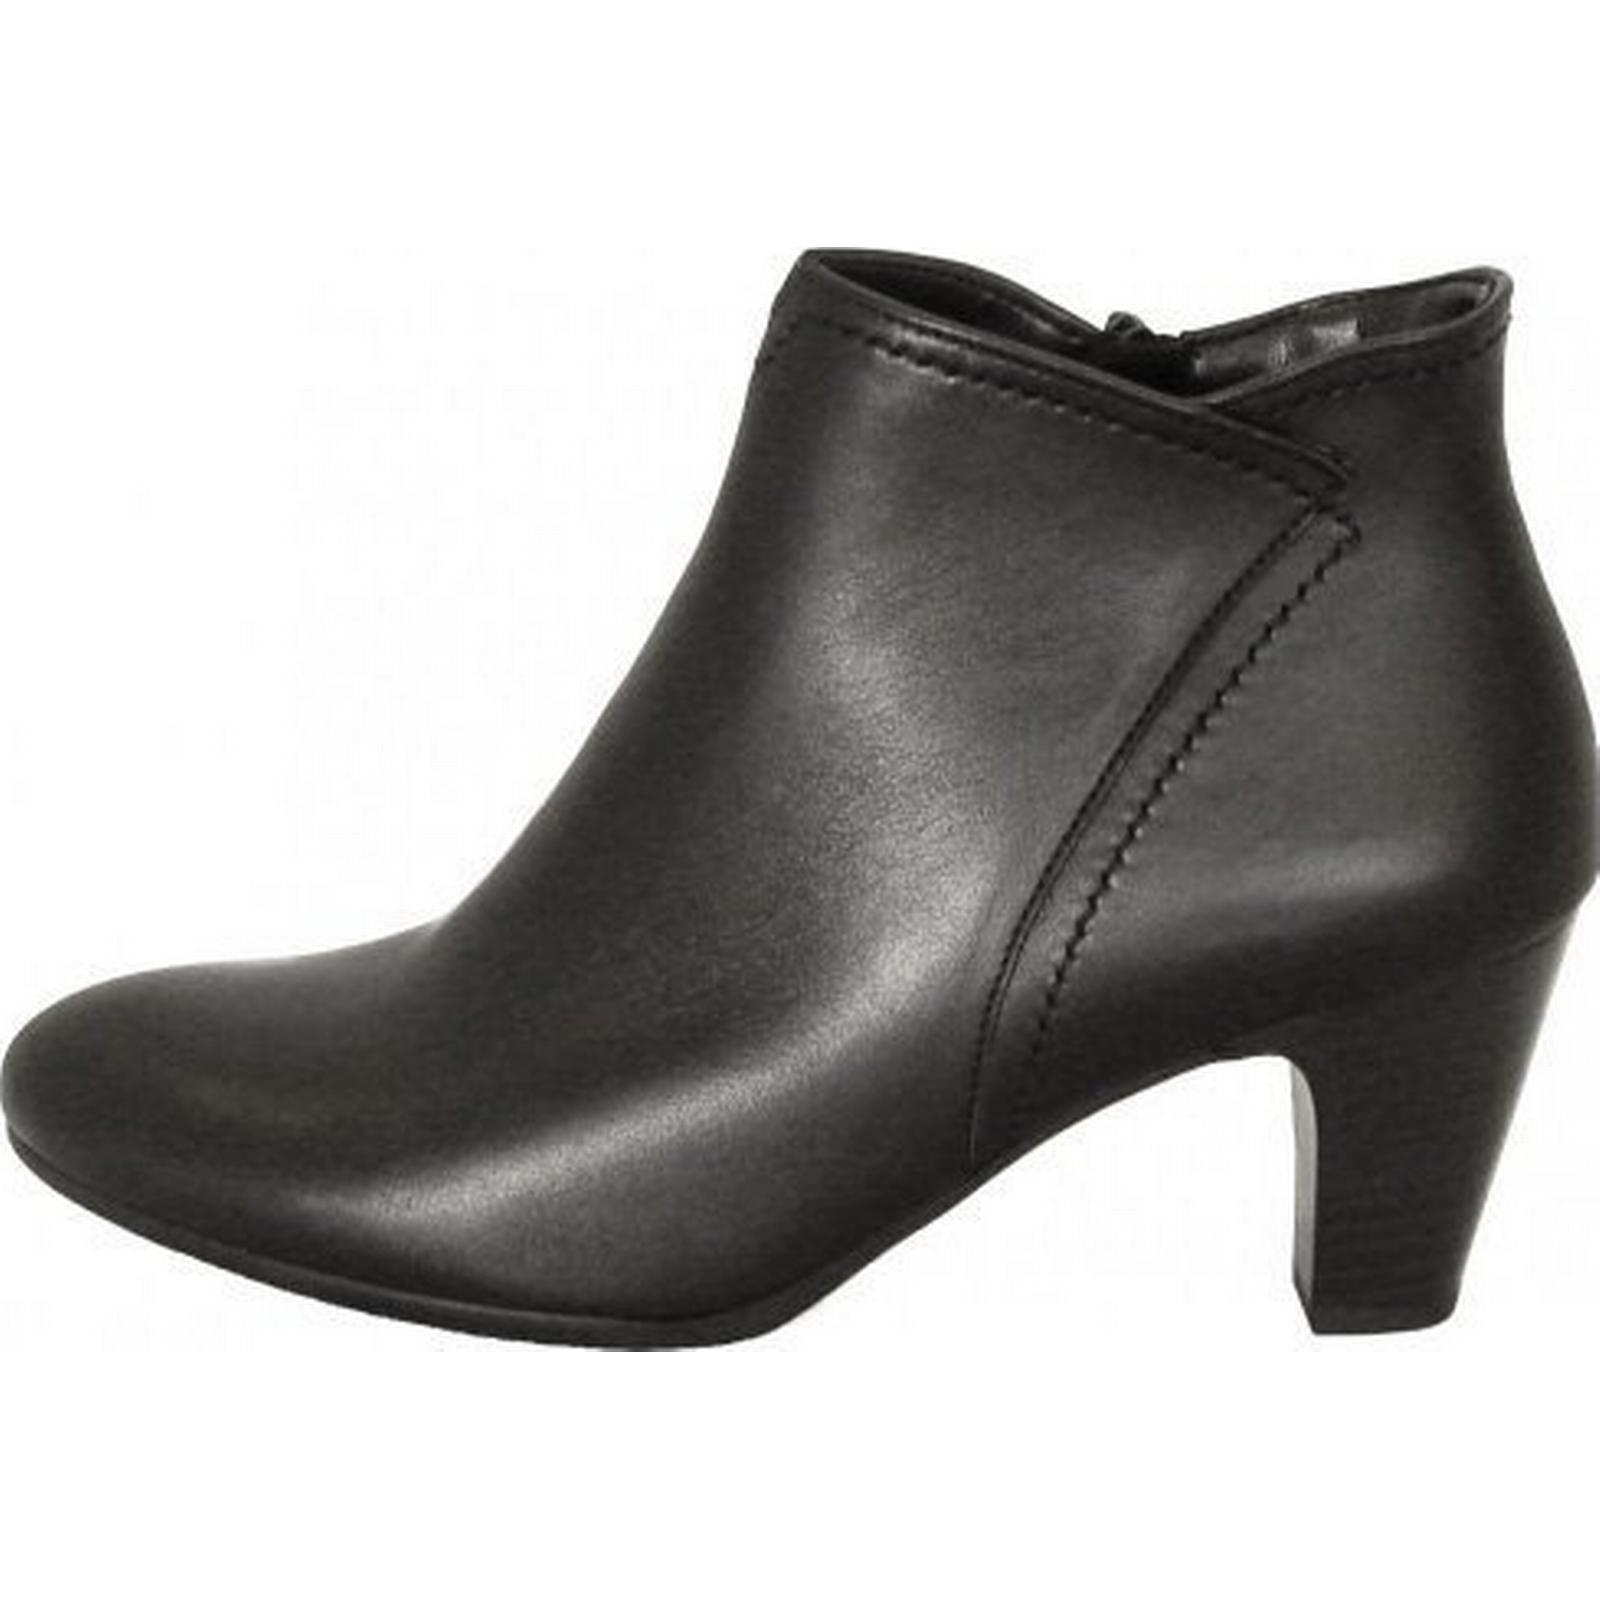 Gabor JANGLE GABOR BOOTS JANGLE 55 750 Size: 27 Size: 750 5, Colour: BLACK b133f7